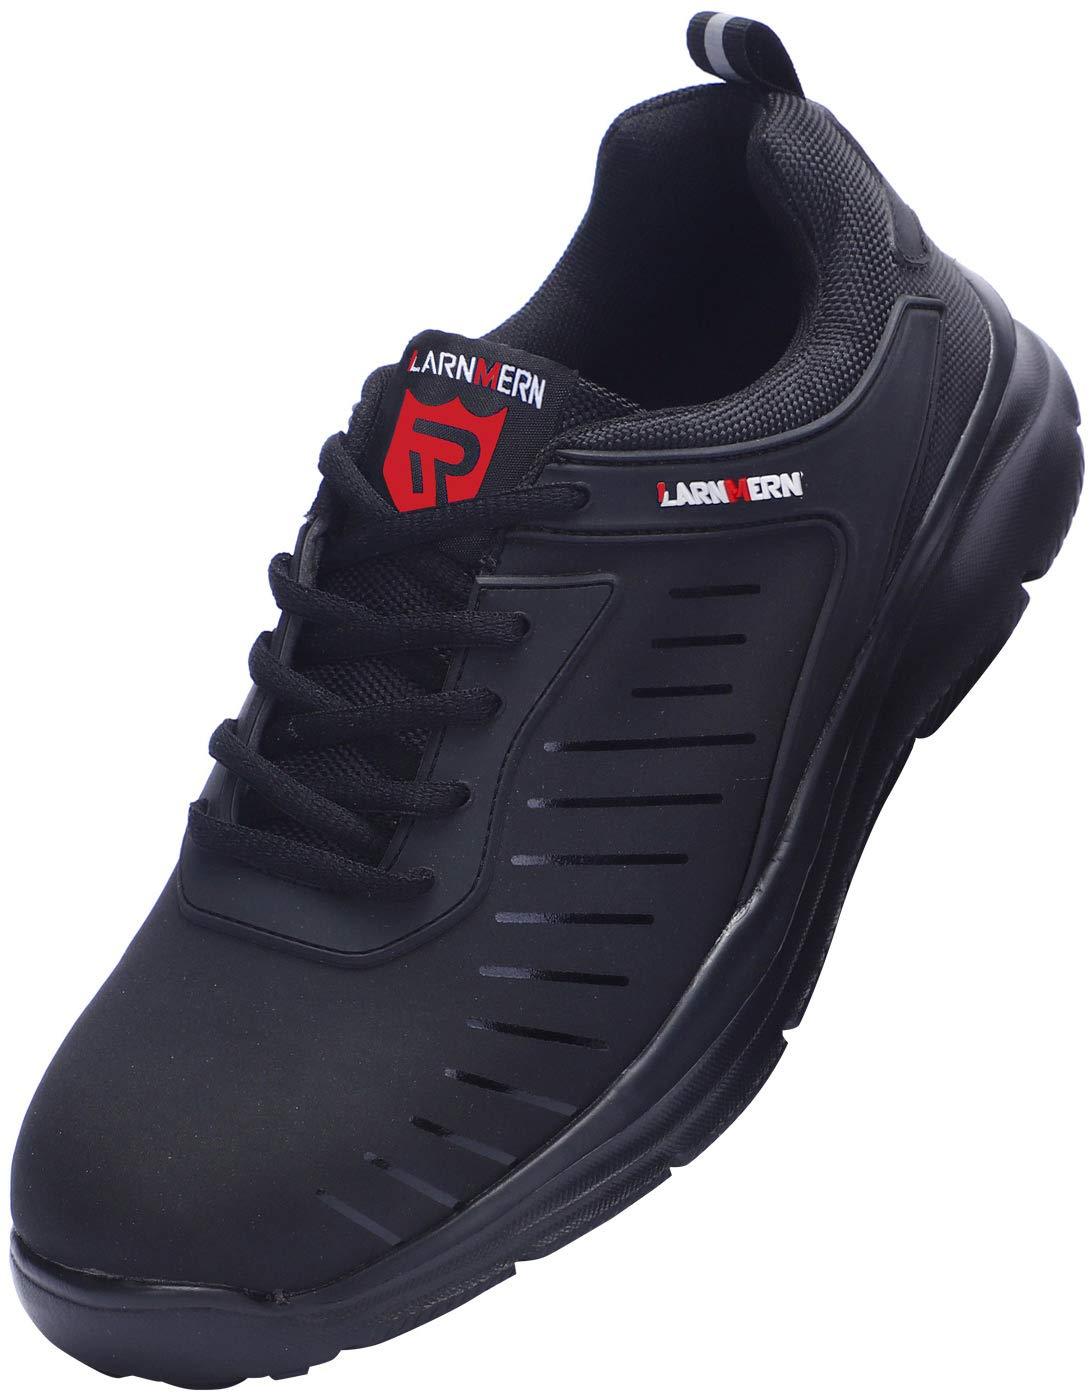 Black Himalayan Unisex Adults Skater Style Safety Shoes 3 UK 37 EU Black